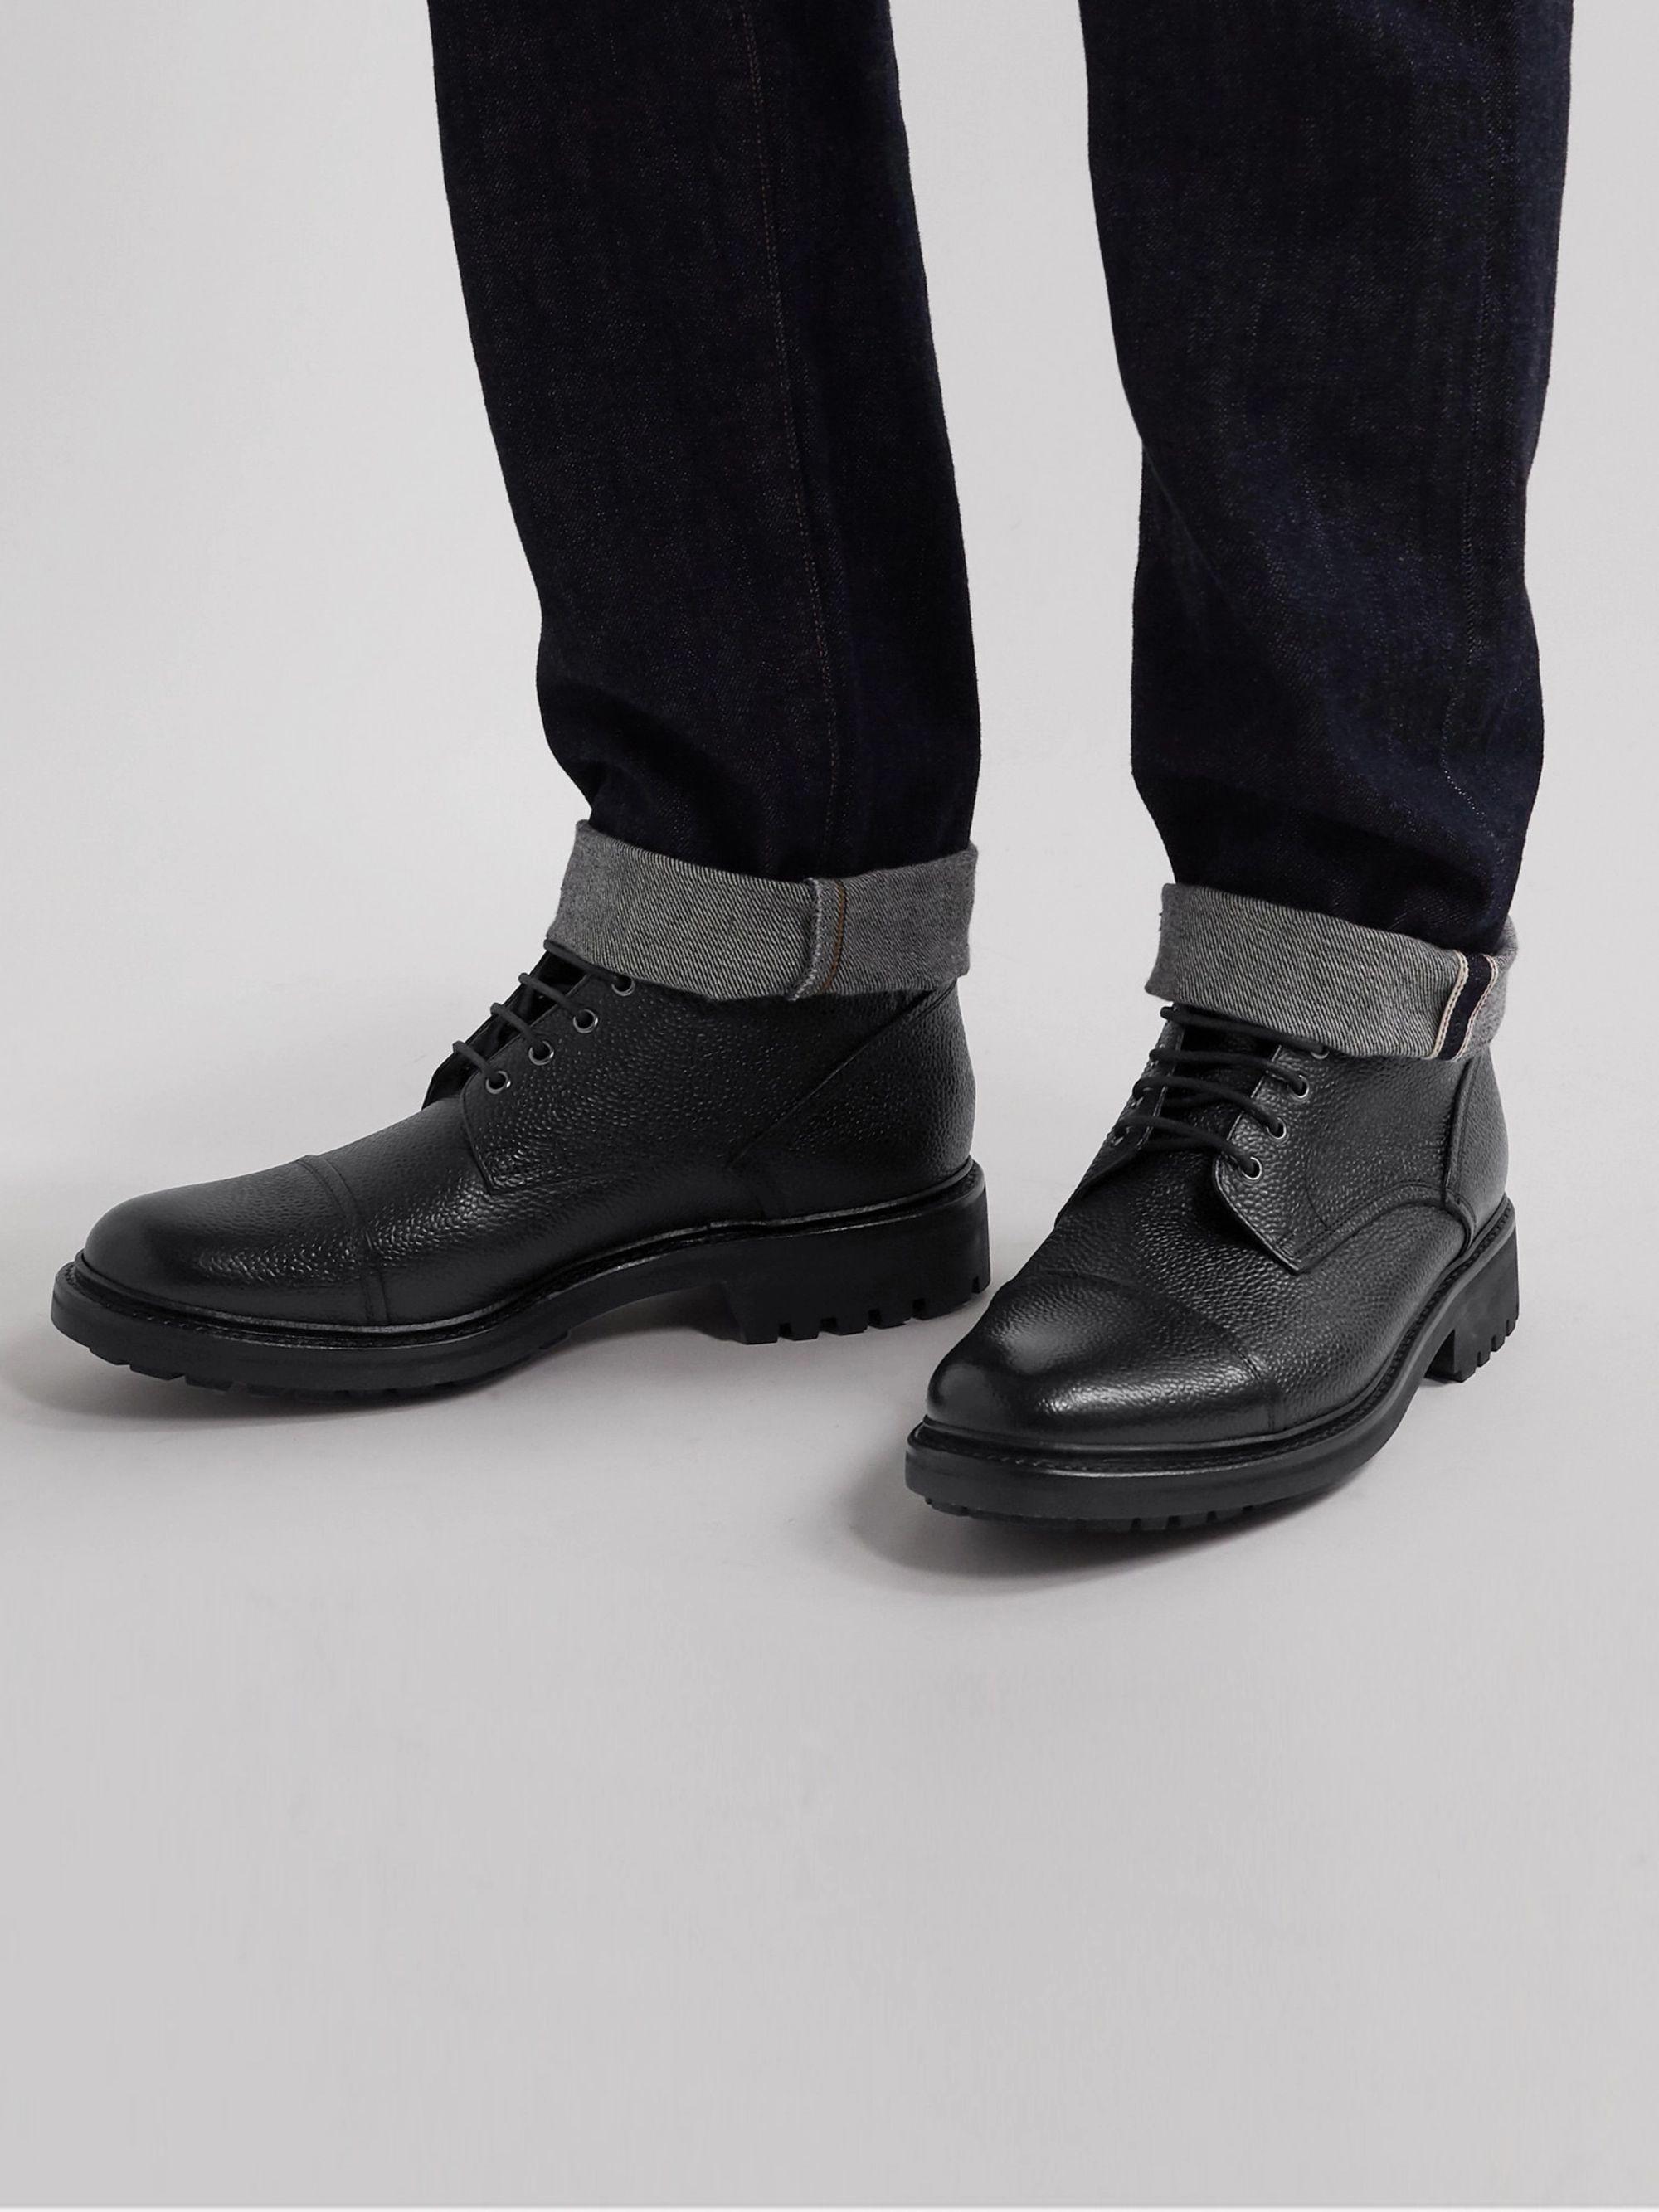 GRENSON Joseph Cap-Toe Pebble-Grain Leather Boots